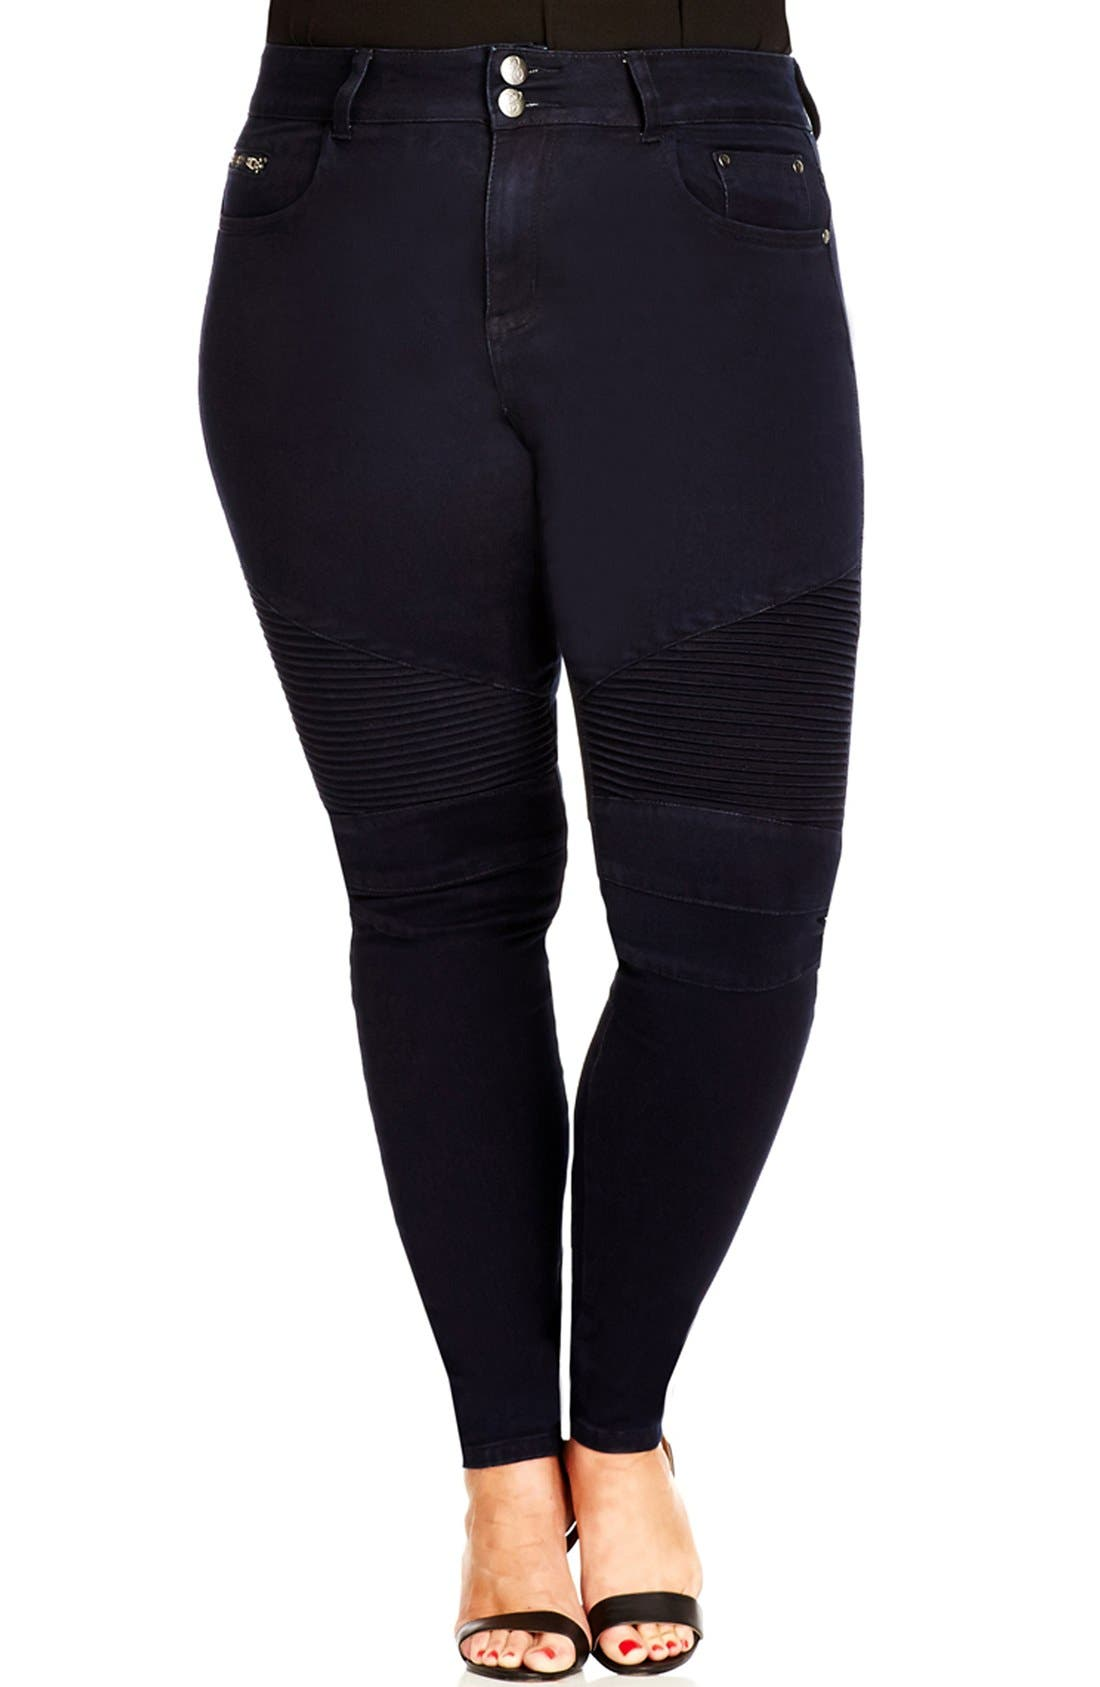 Alternate Image 1 Selected - City Chic 'Moto' Stretch Skinny Jeans (Dark Denim) (Plus Size)